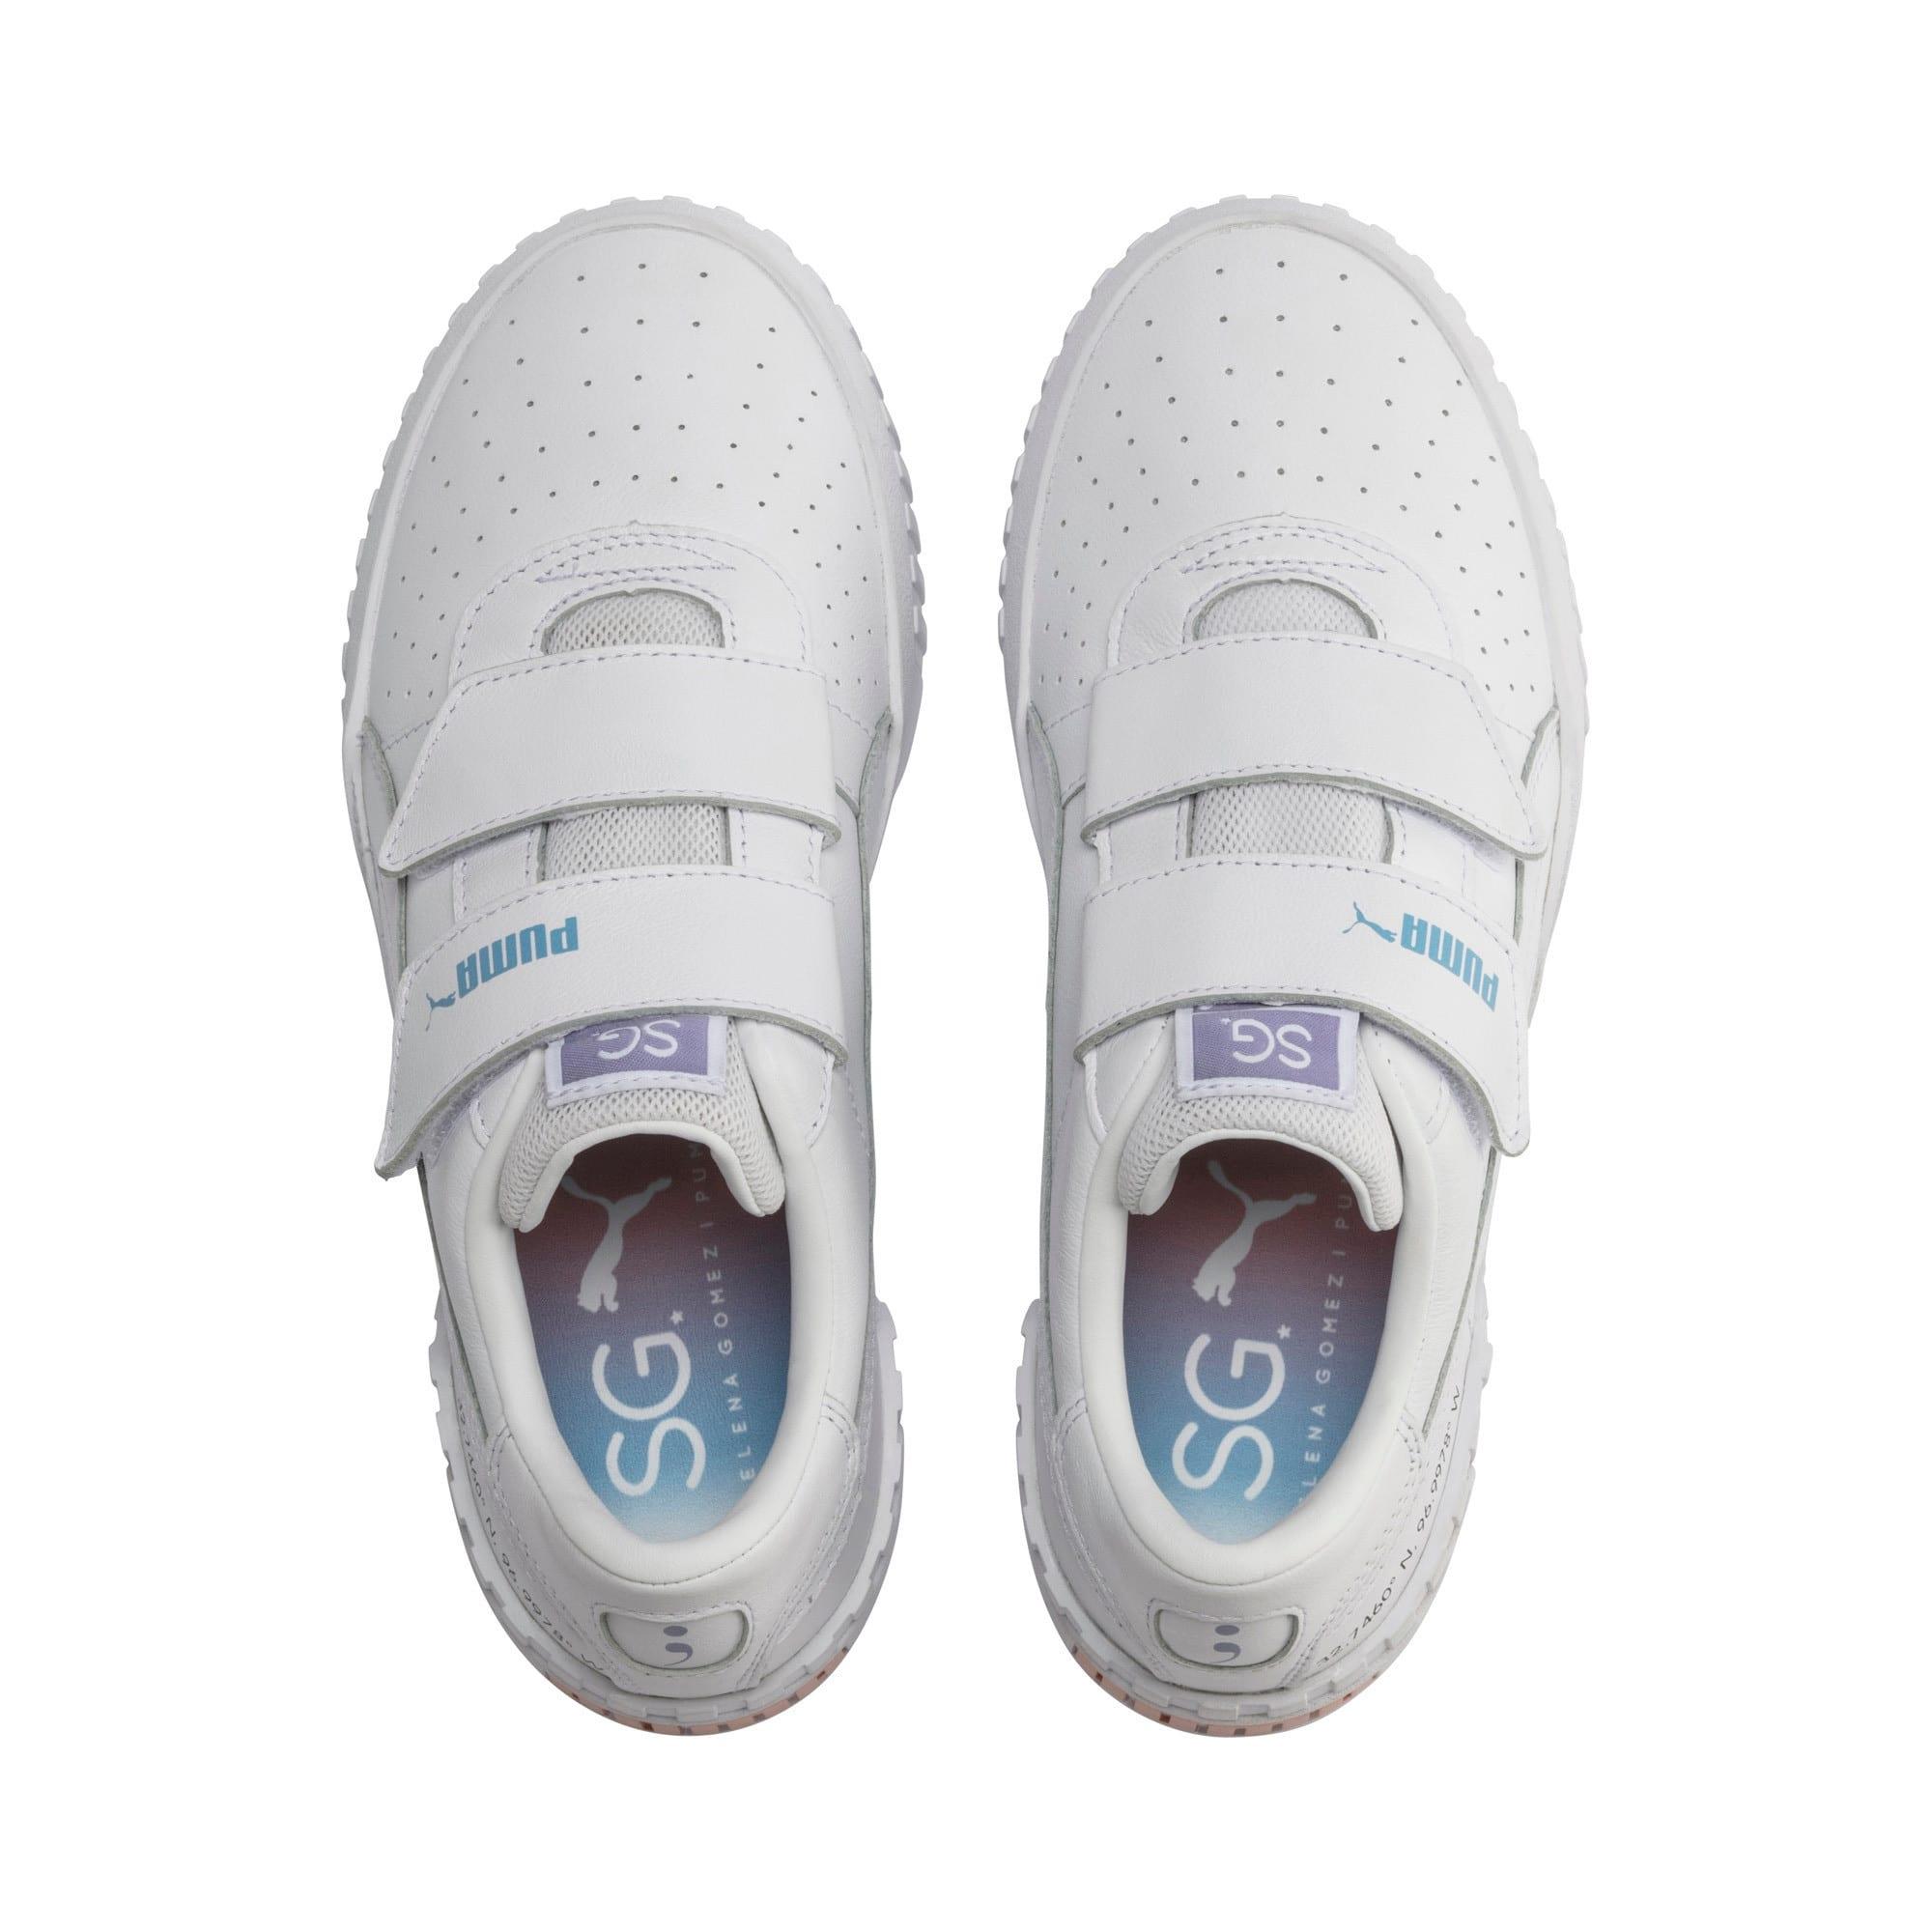 Thumbnail 7 of SG x Cali Women's Sneakers, Puma White-Puma White, medium